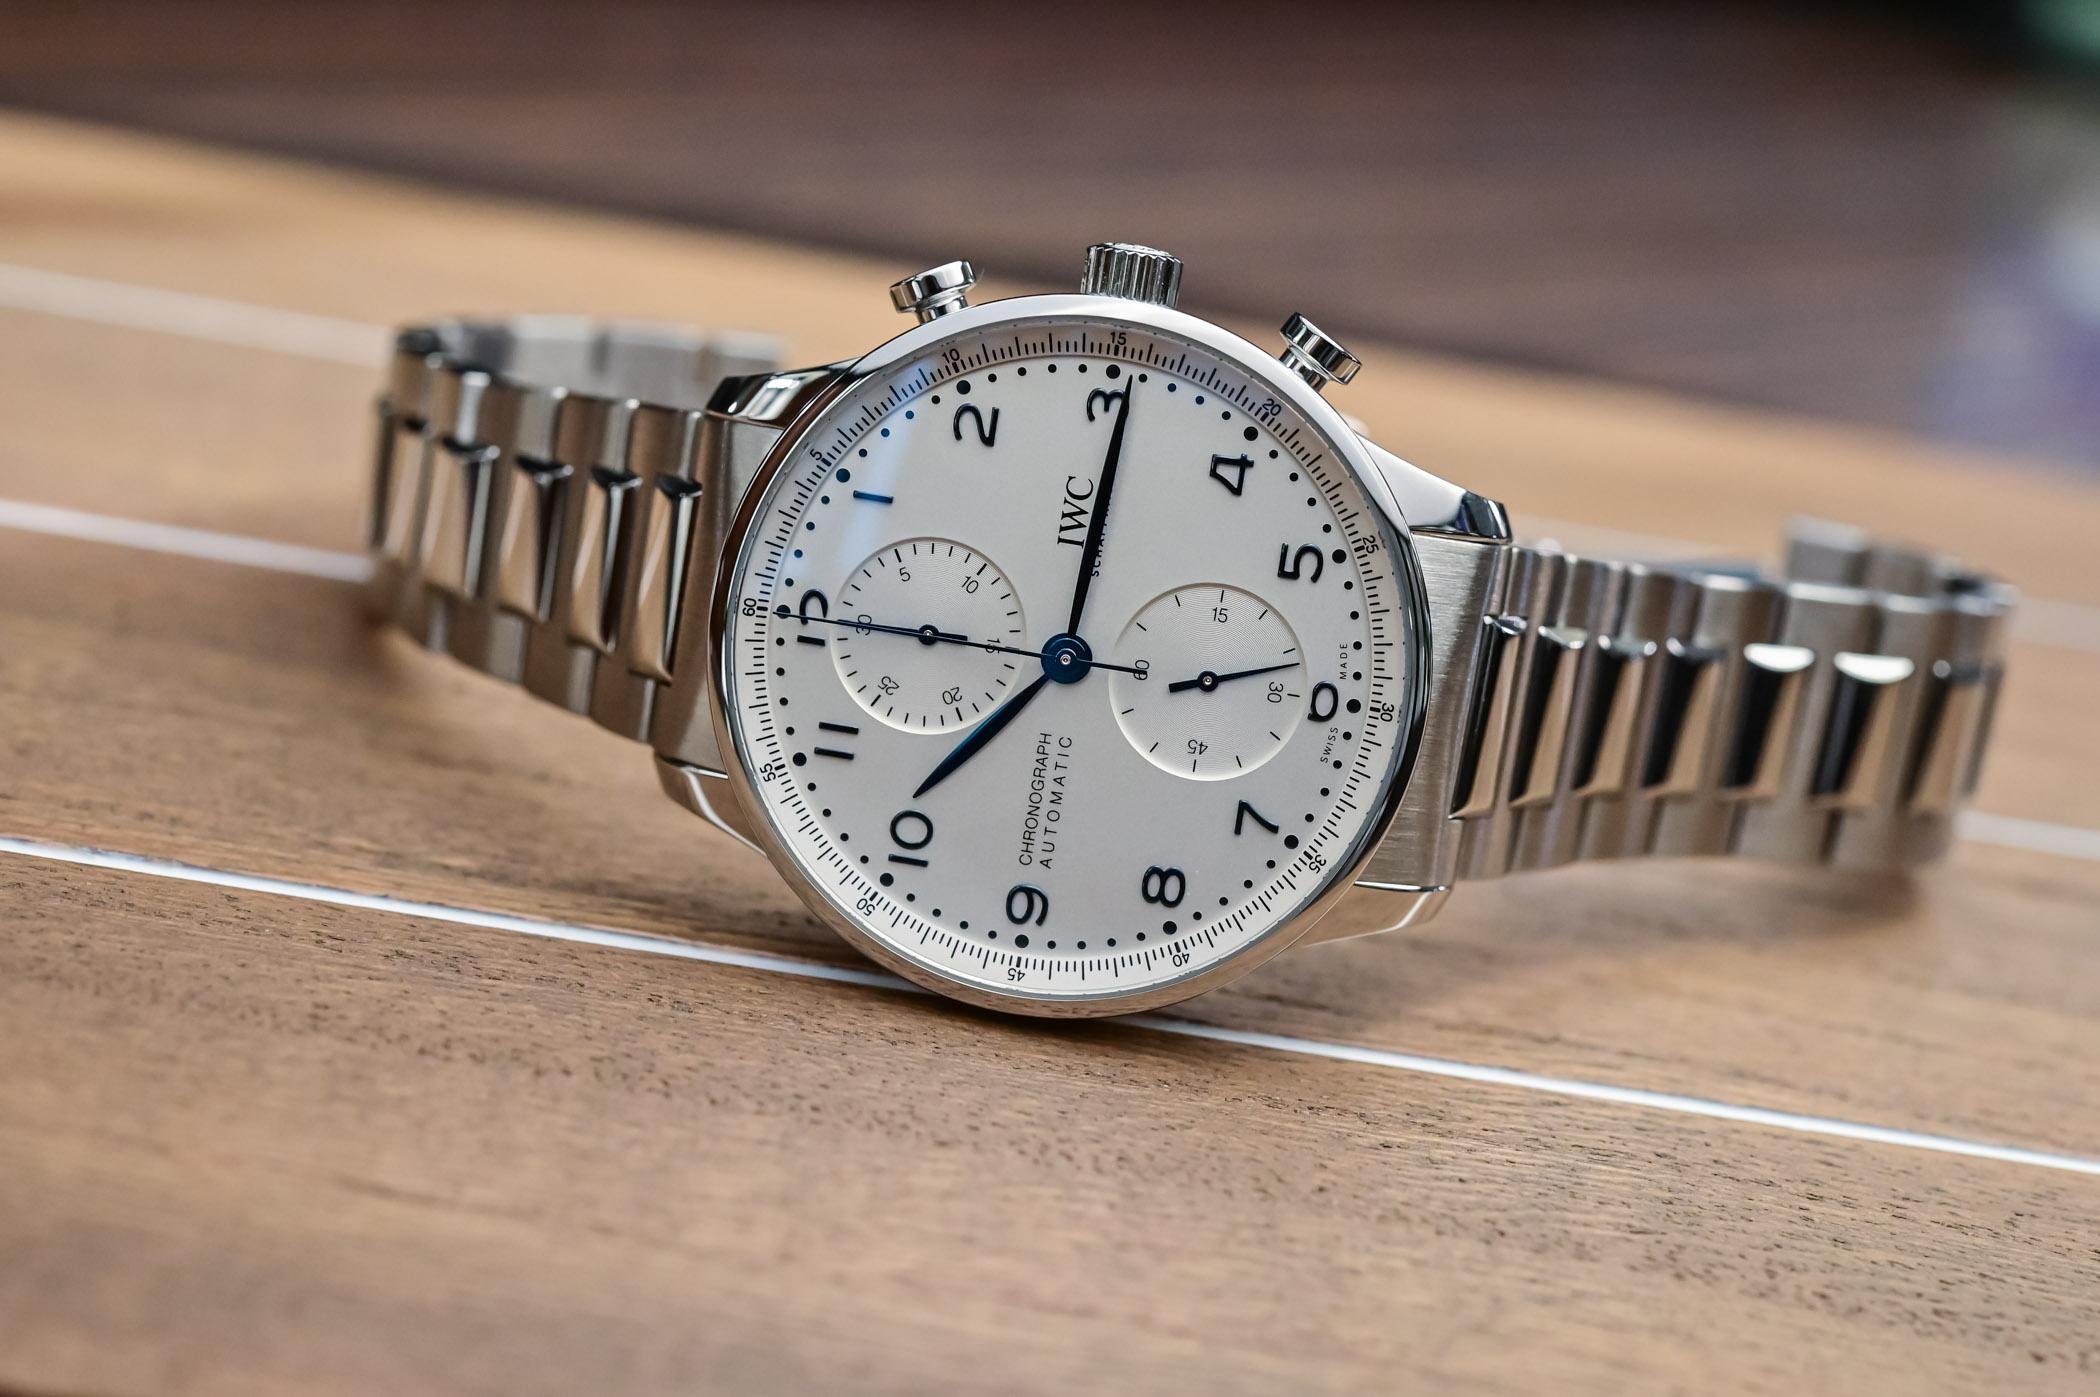 IWC Portugieser Chronograph 3716 Steel Bracelet IW371617 - 7